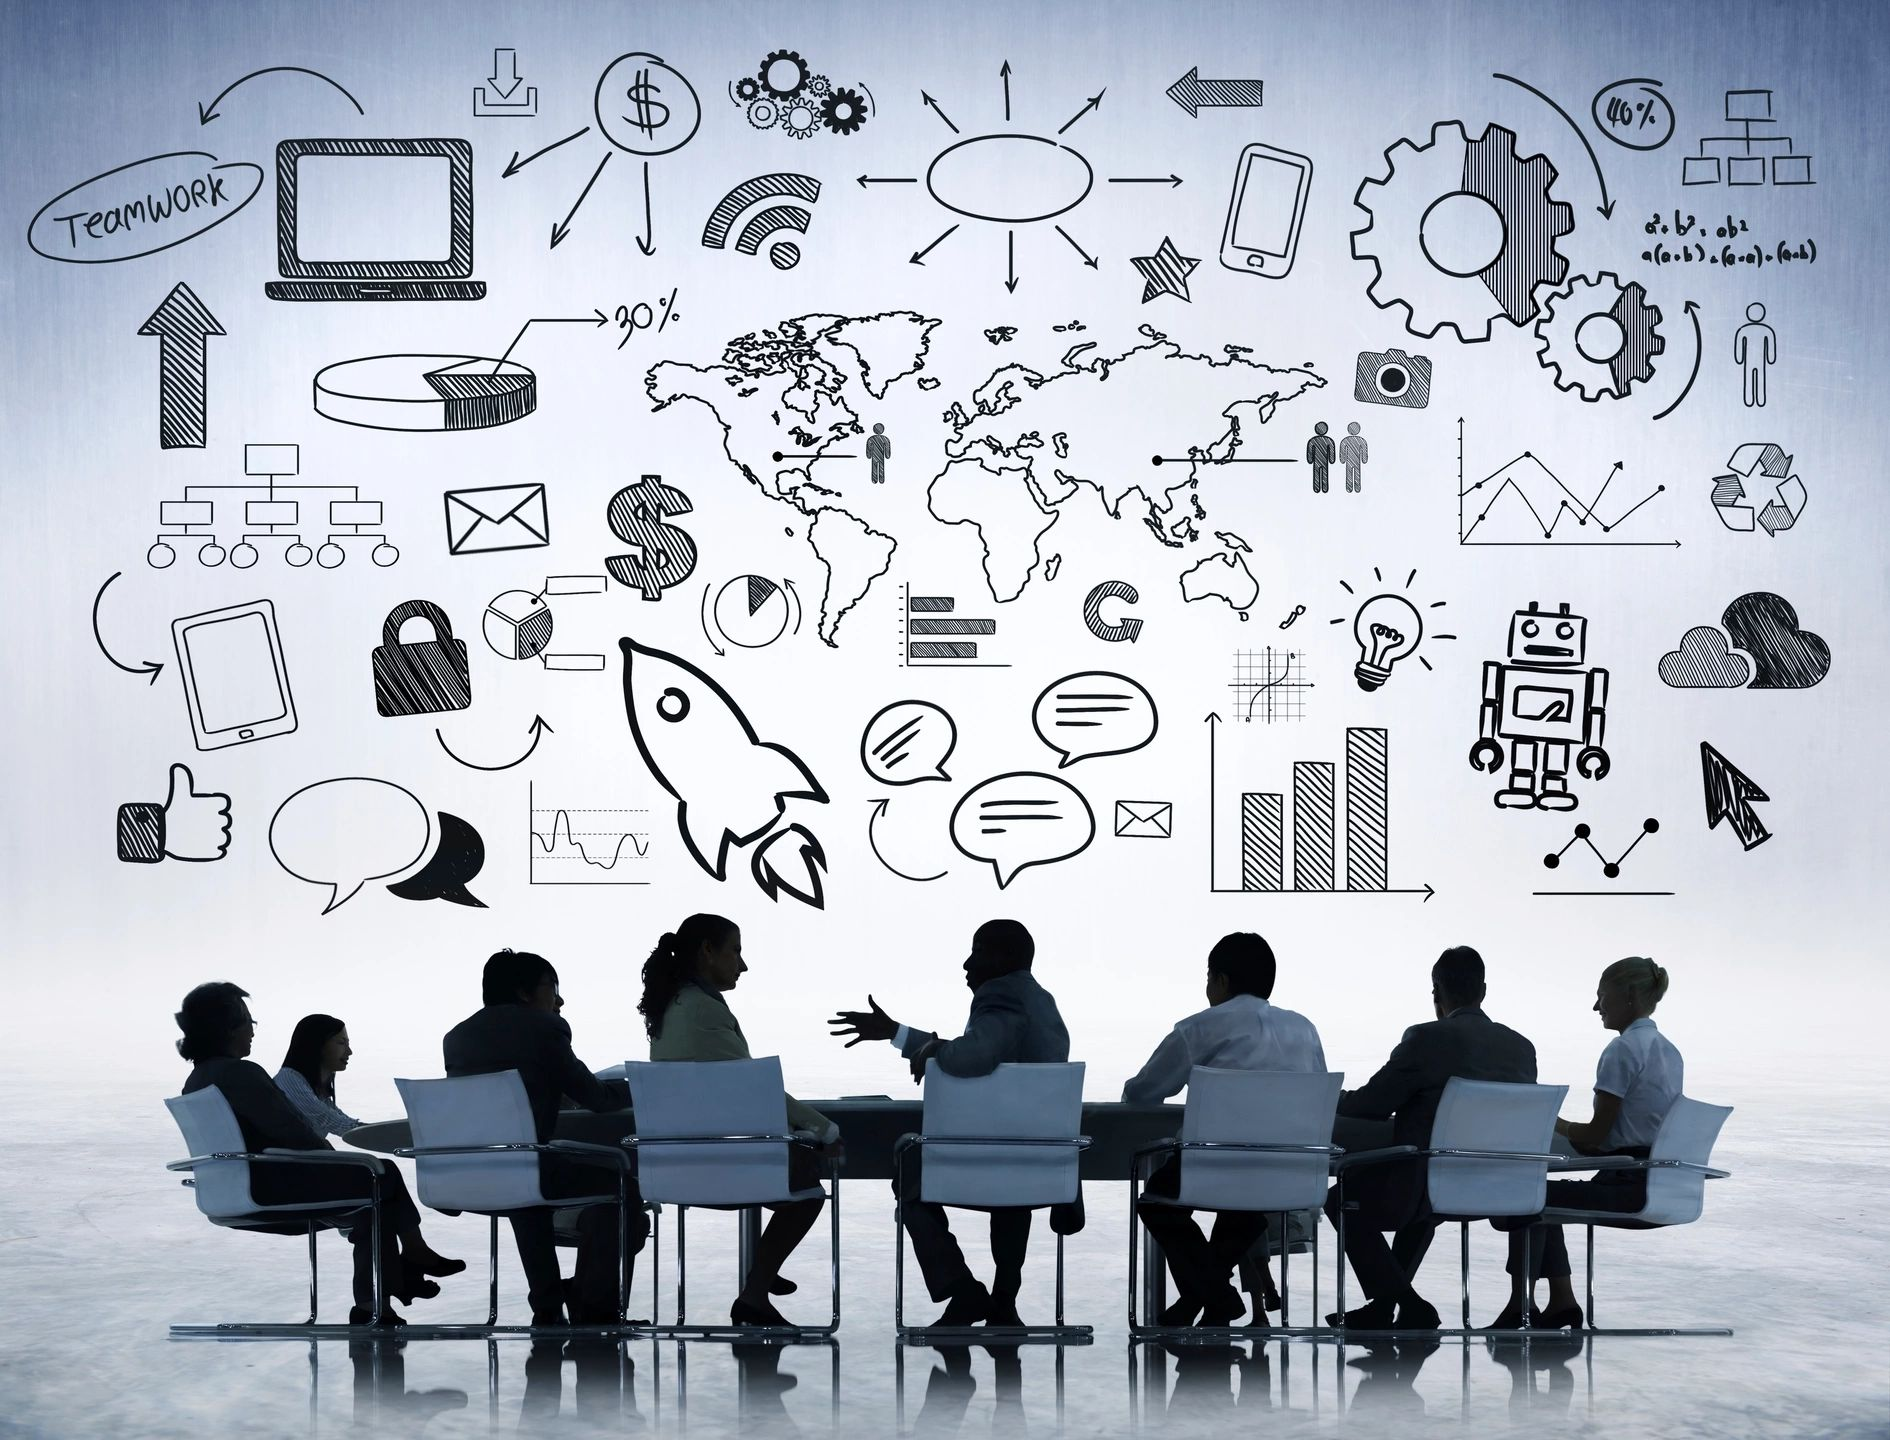 Group of professionals brainstorming SEO strategies